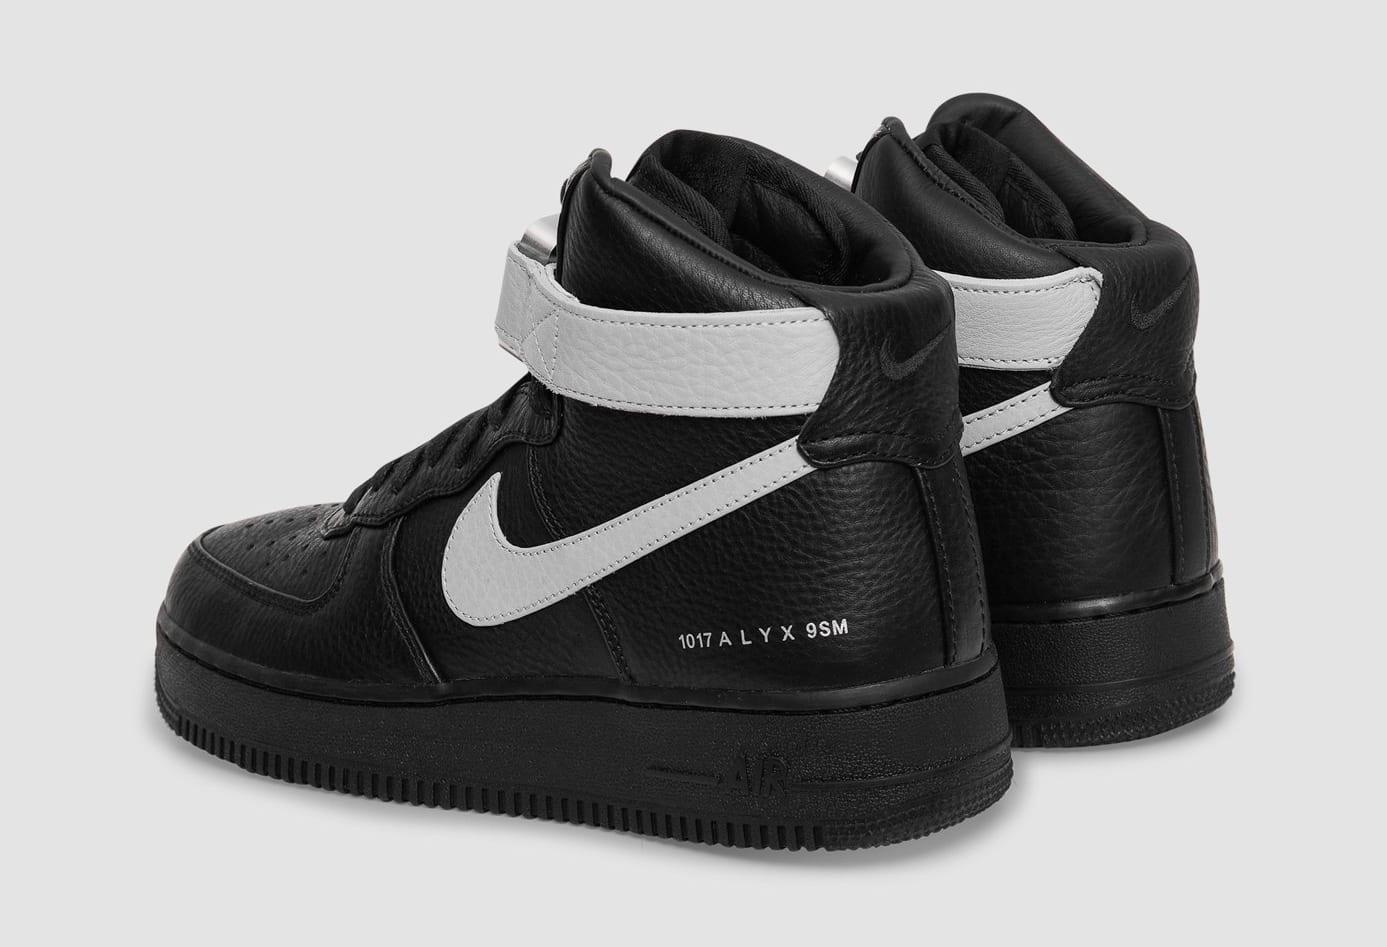 Alyx x Nike Air Force 1 High CQ4018-003 Heel